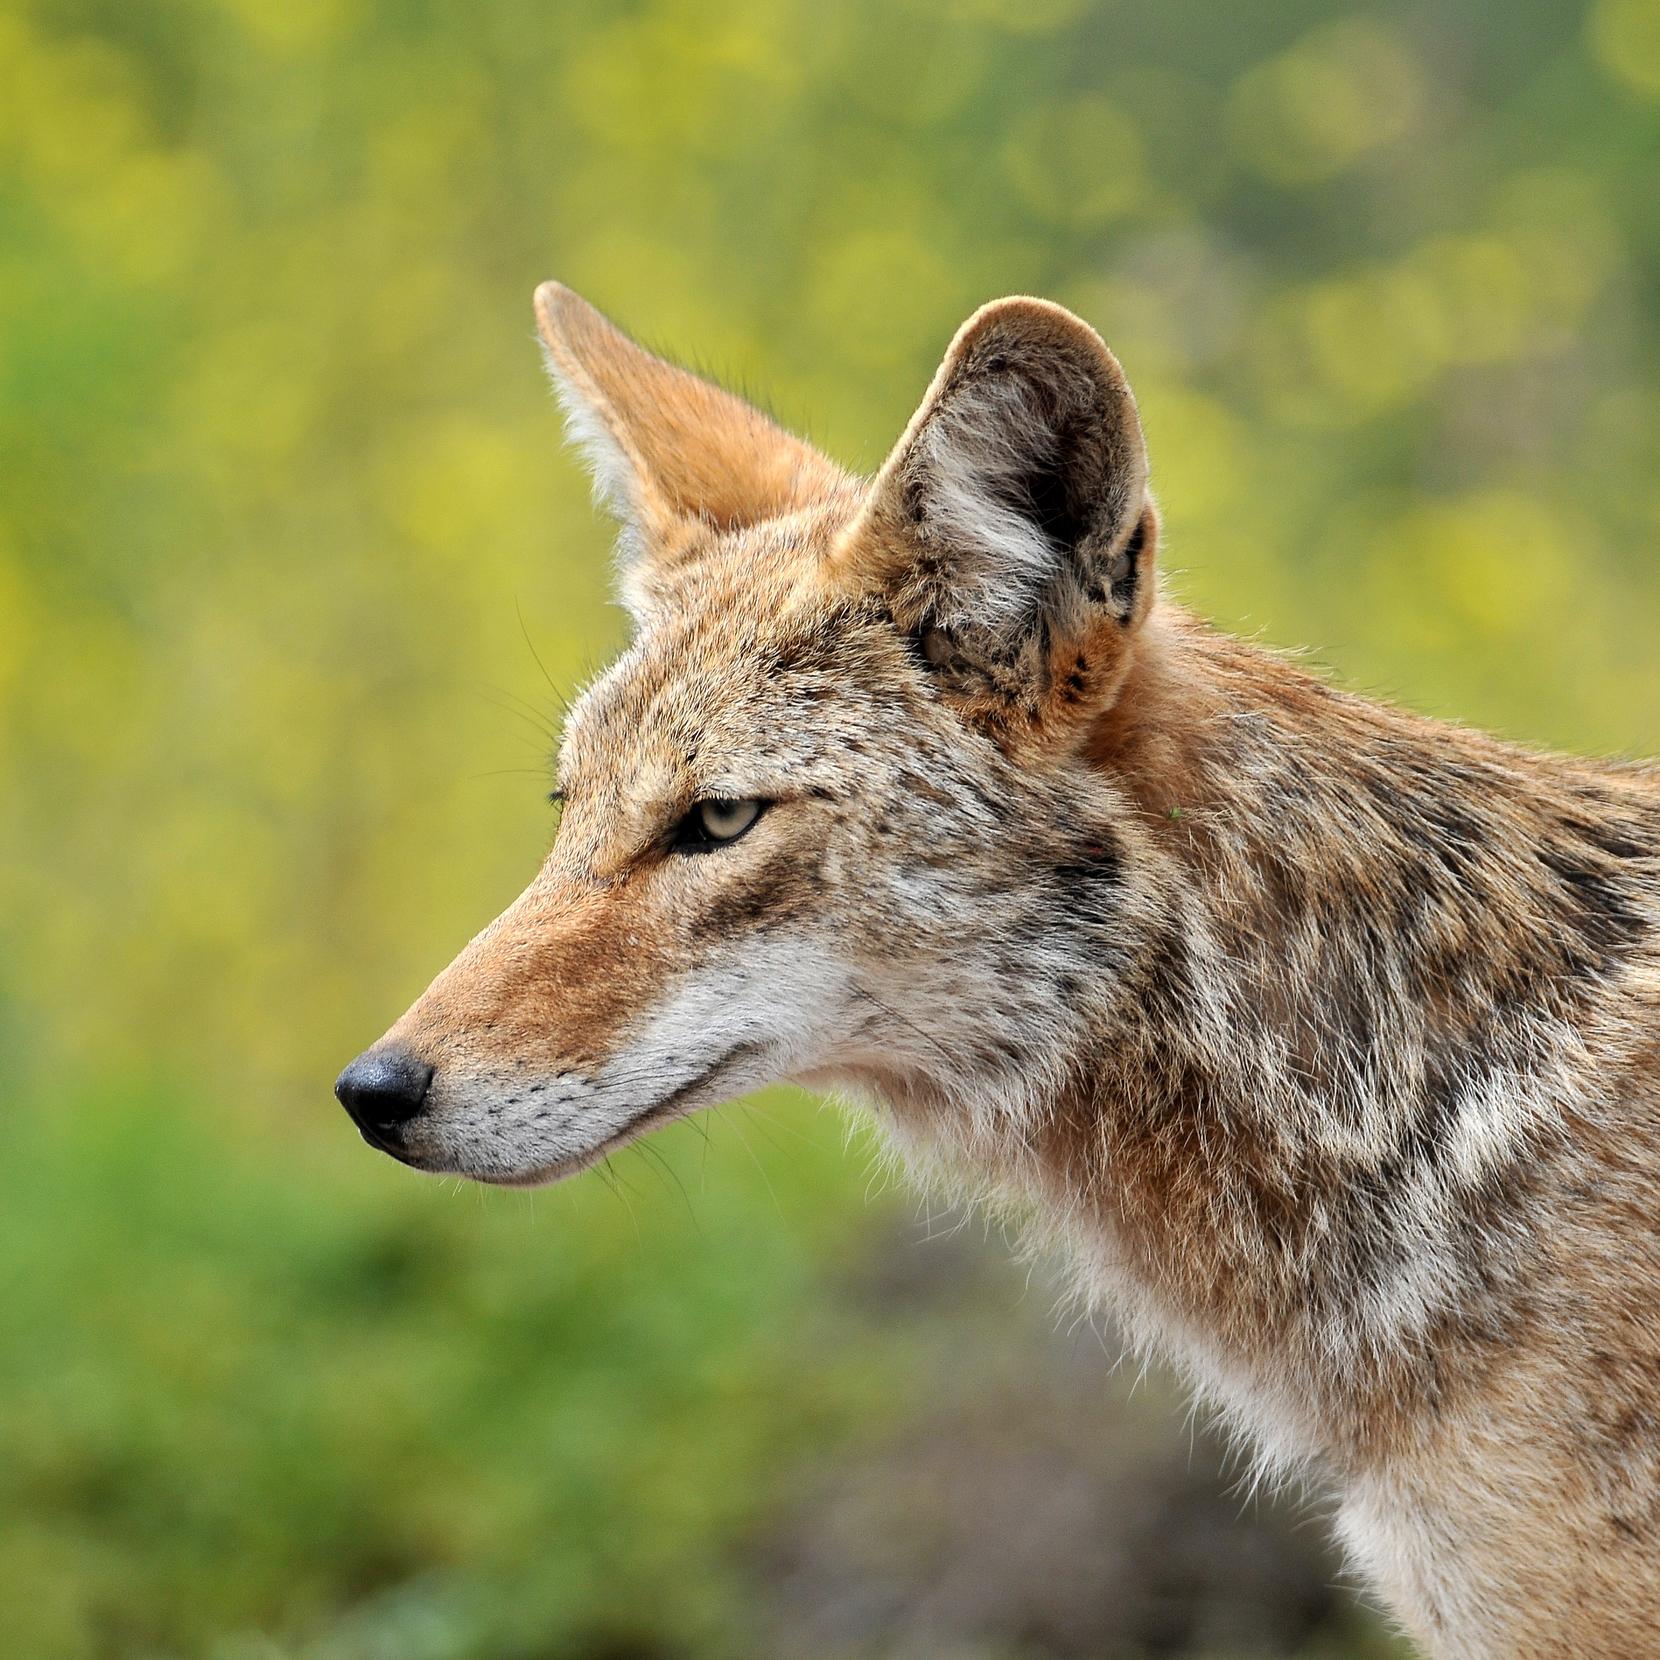 Coyote photo credit Matt Knoth.